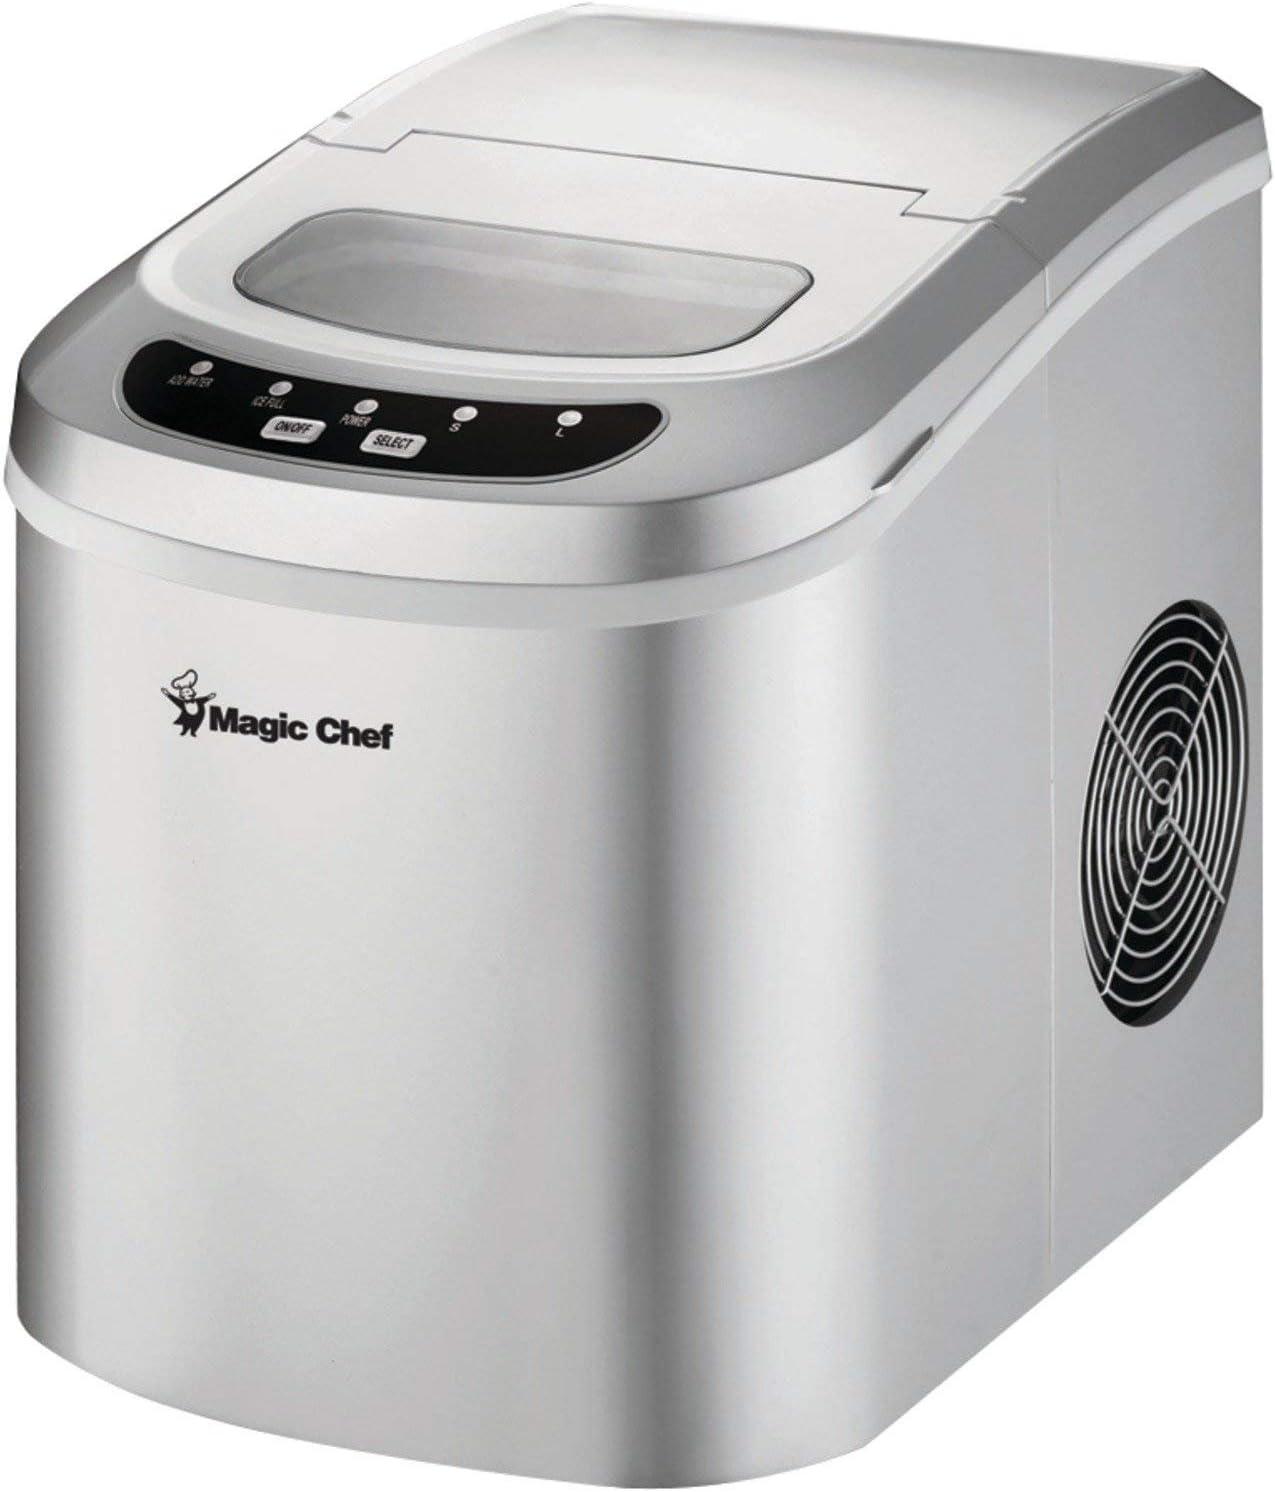 MAGIC CHEF MCIM22SV 27lb-Capacity Portable Mini Ice Maker Home, garden & living